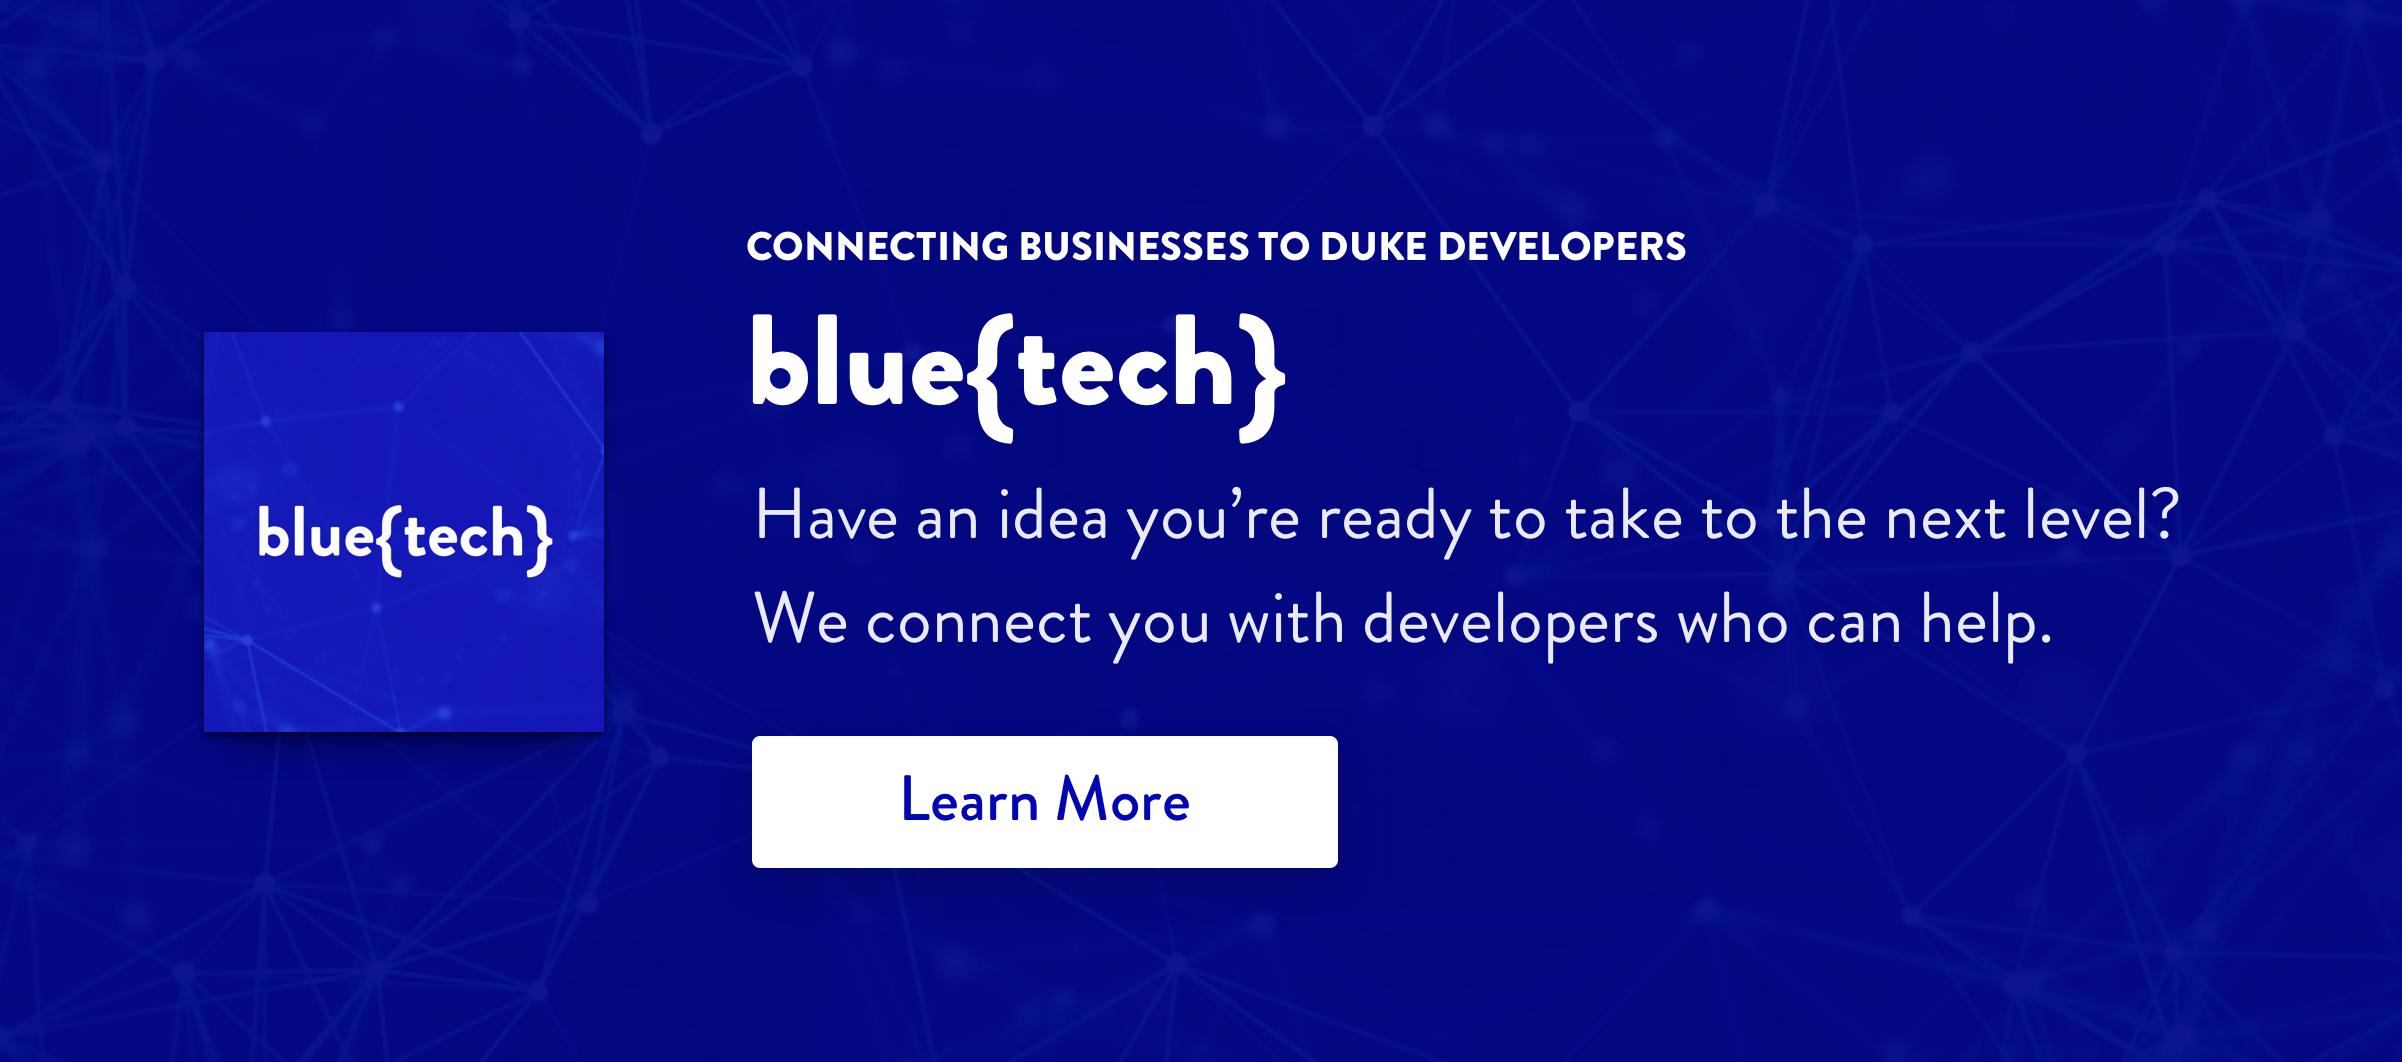 bluetech.png